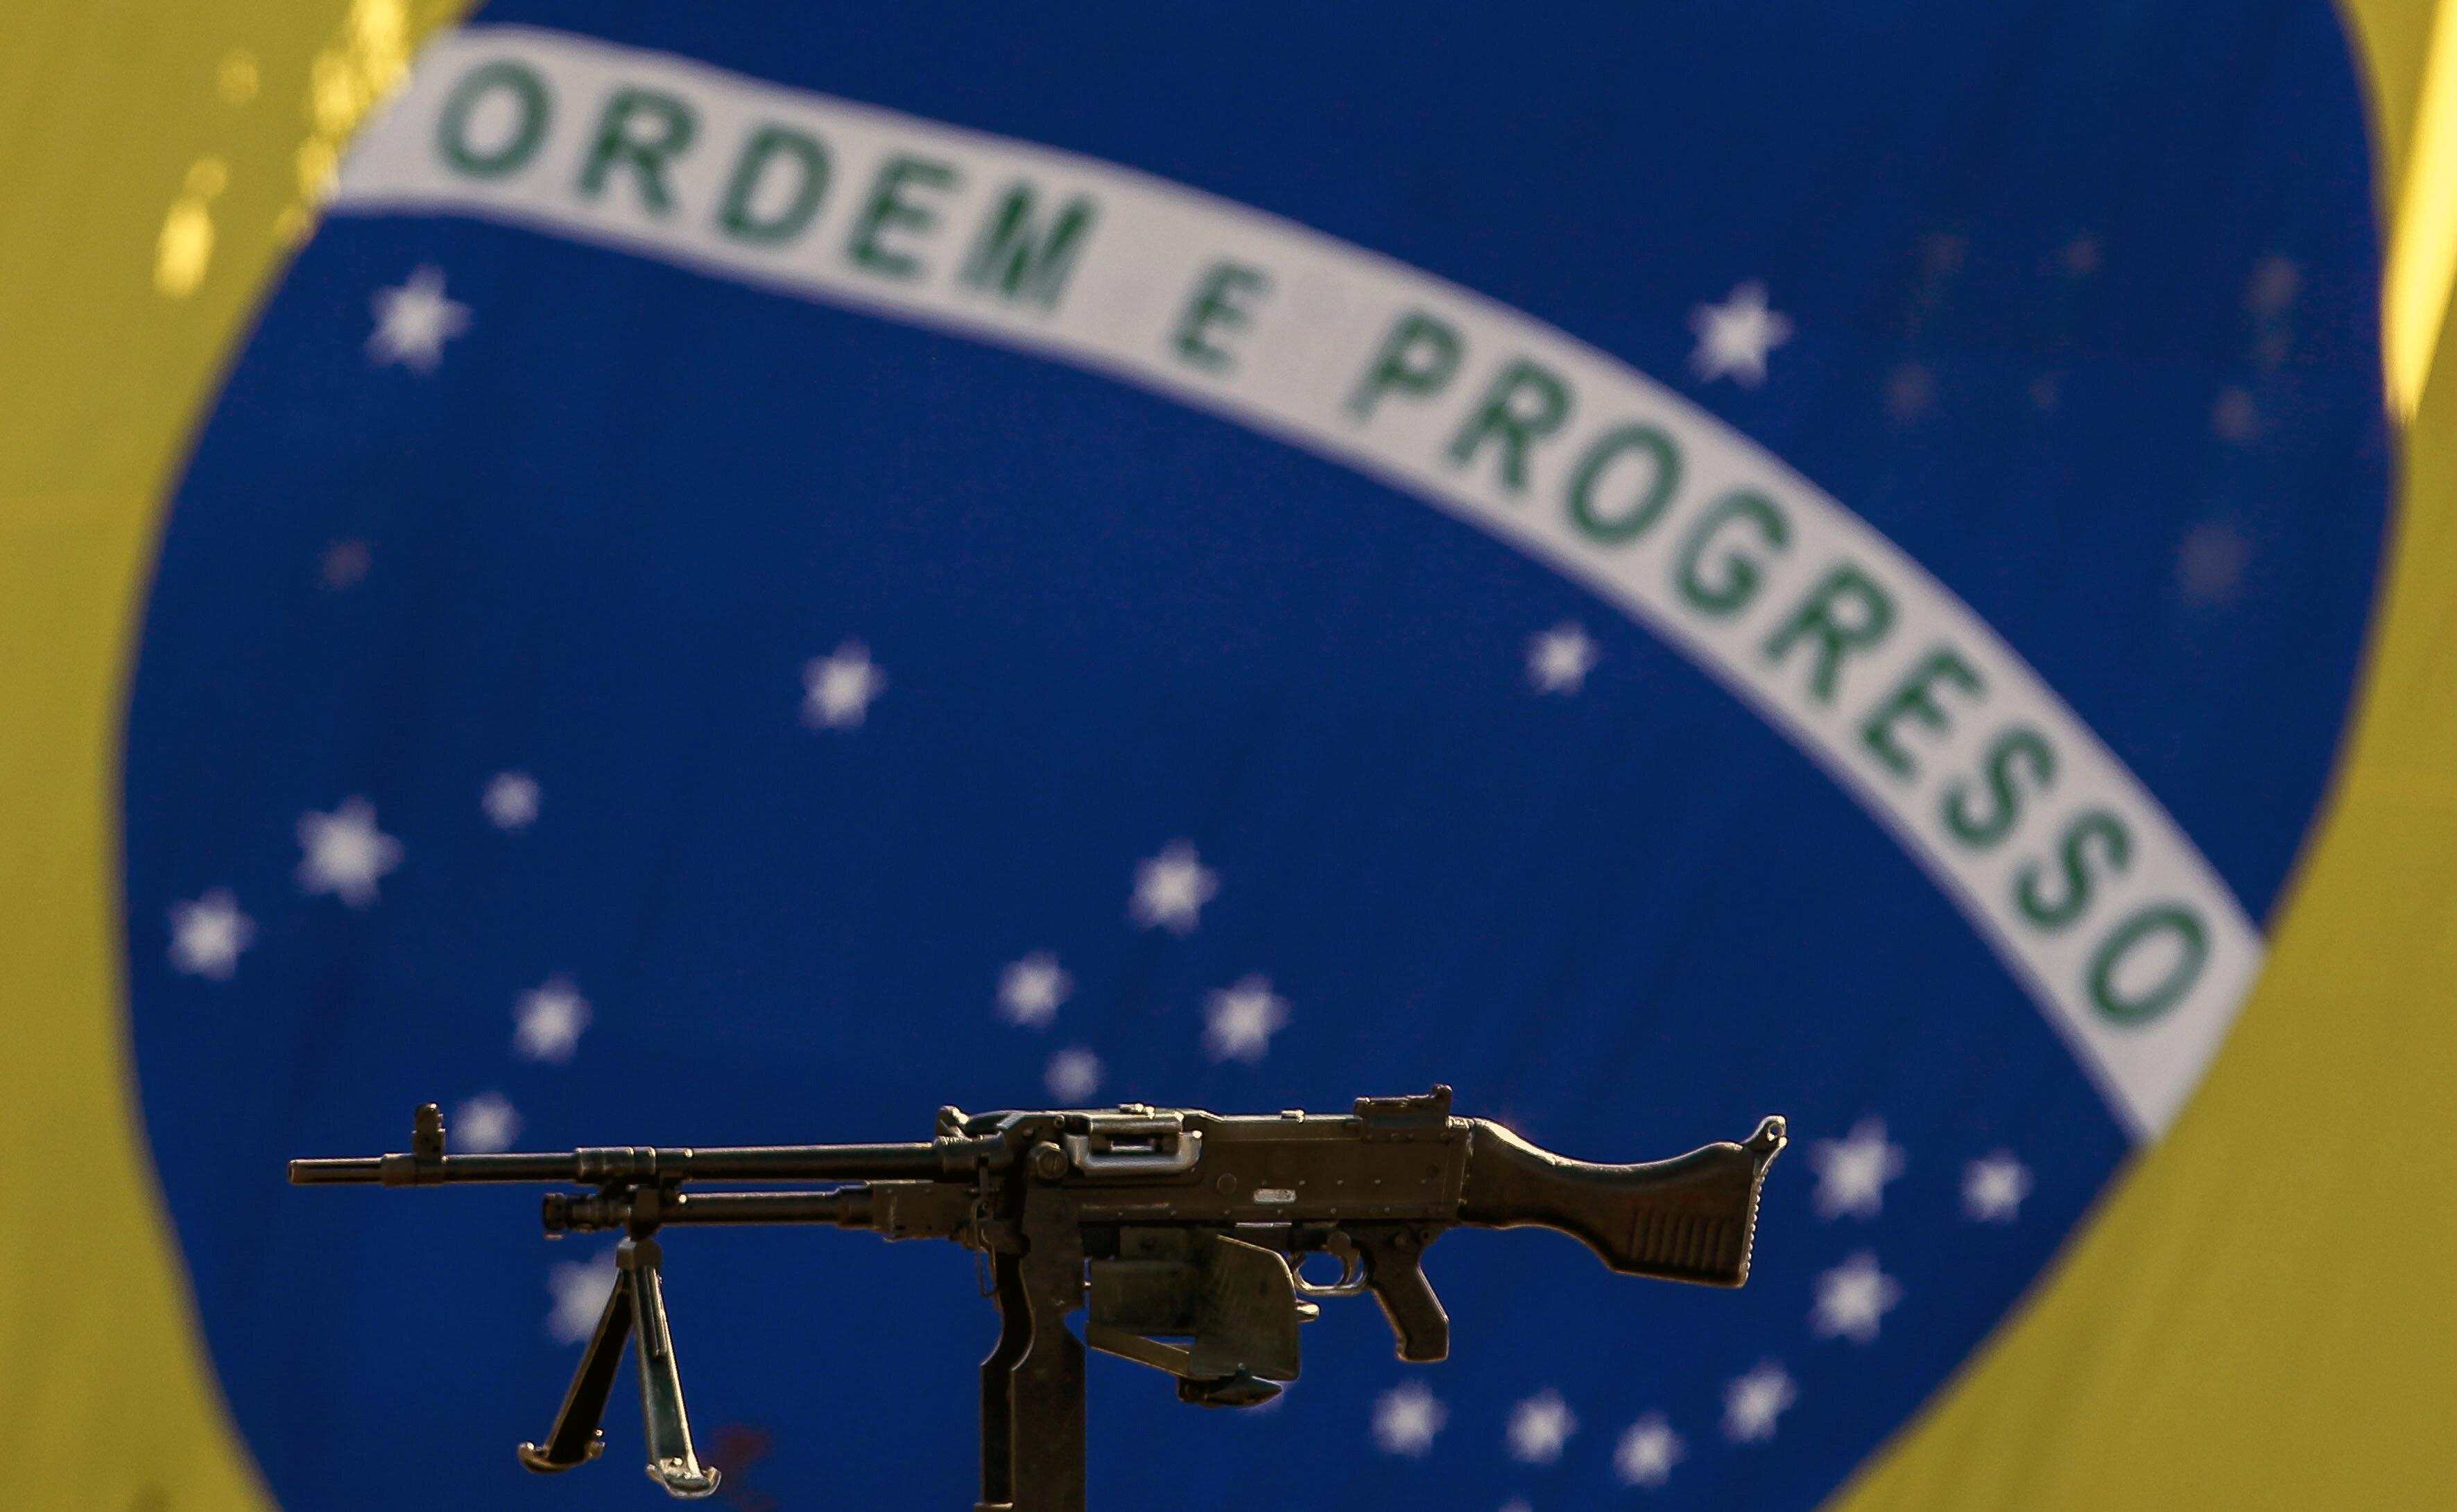 Decreto de armas permite compra de fuzil por cidadão